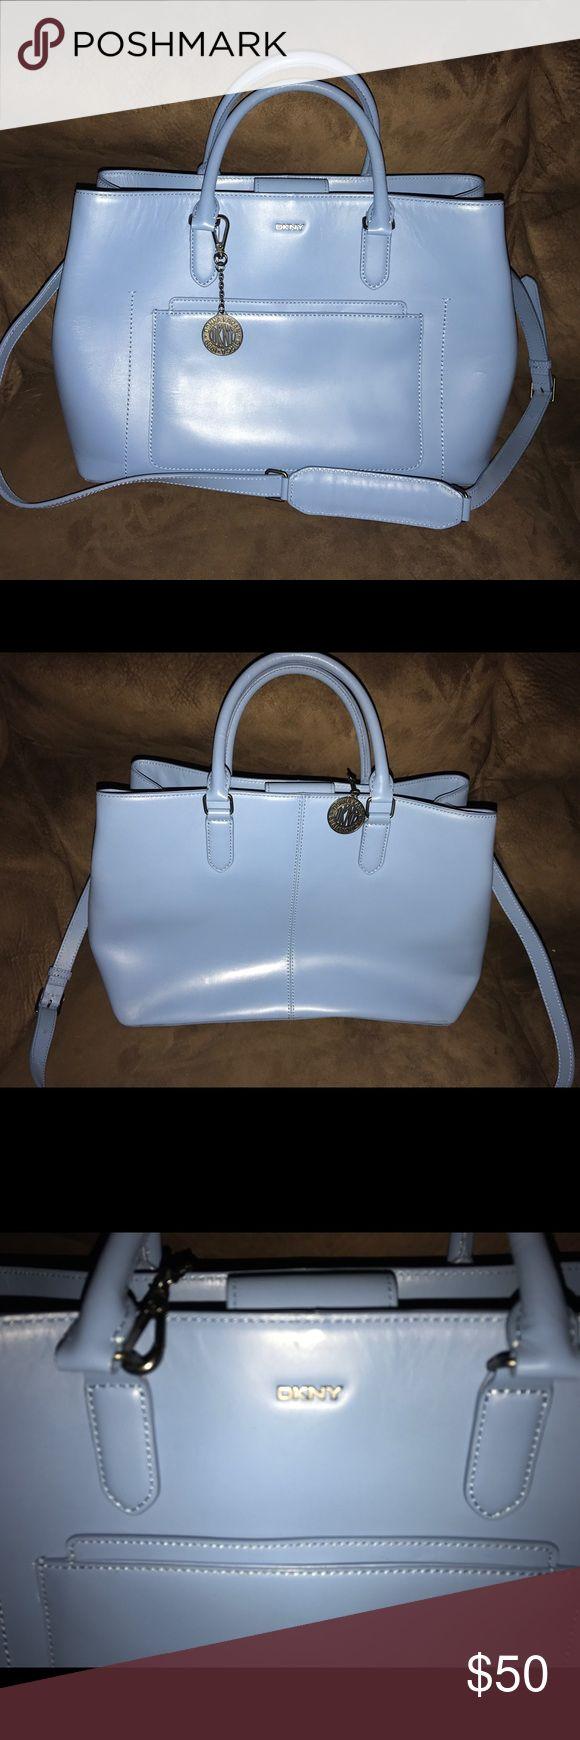 DKNY Handbag DKNY Handbag. NWOT. Very pretty soft blue. Has never been used. Has nice middle zipper pocket for lots of storage. DKNY Bags